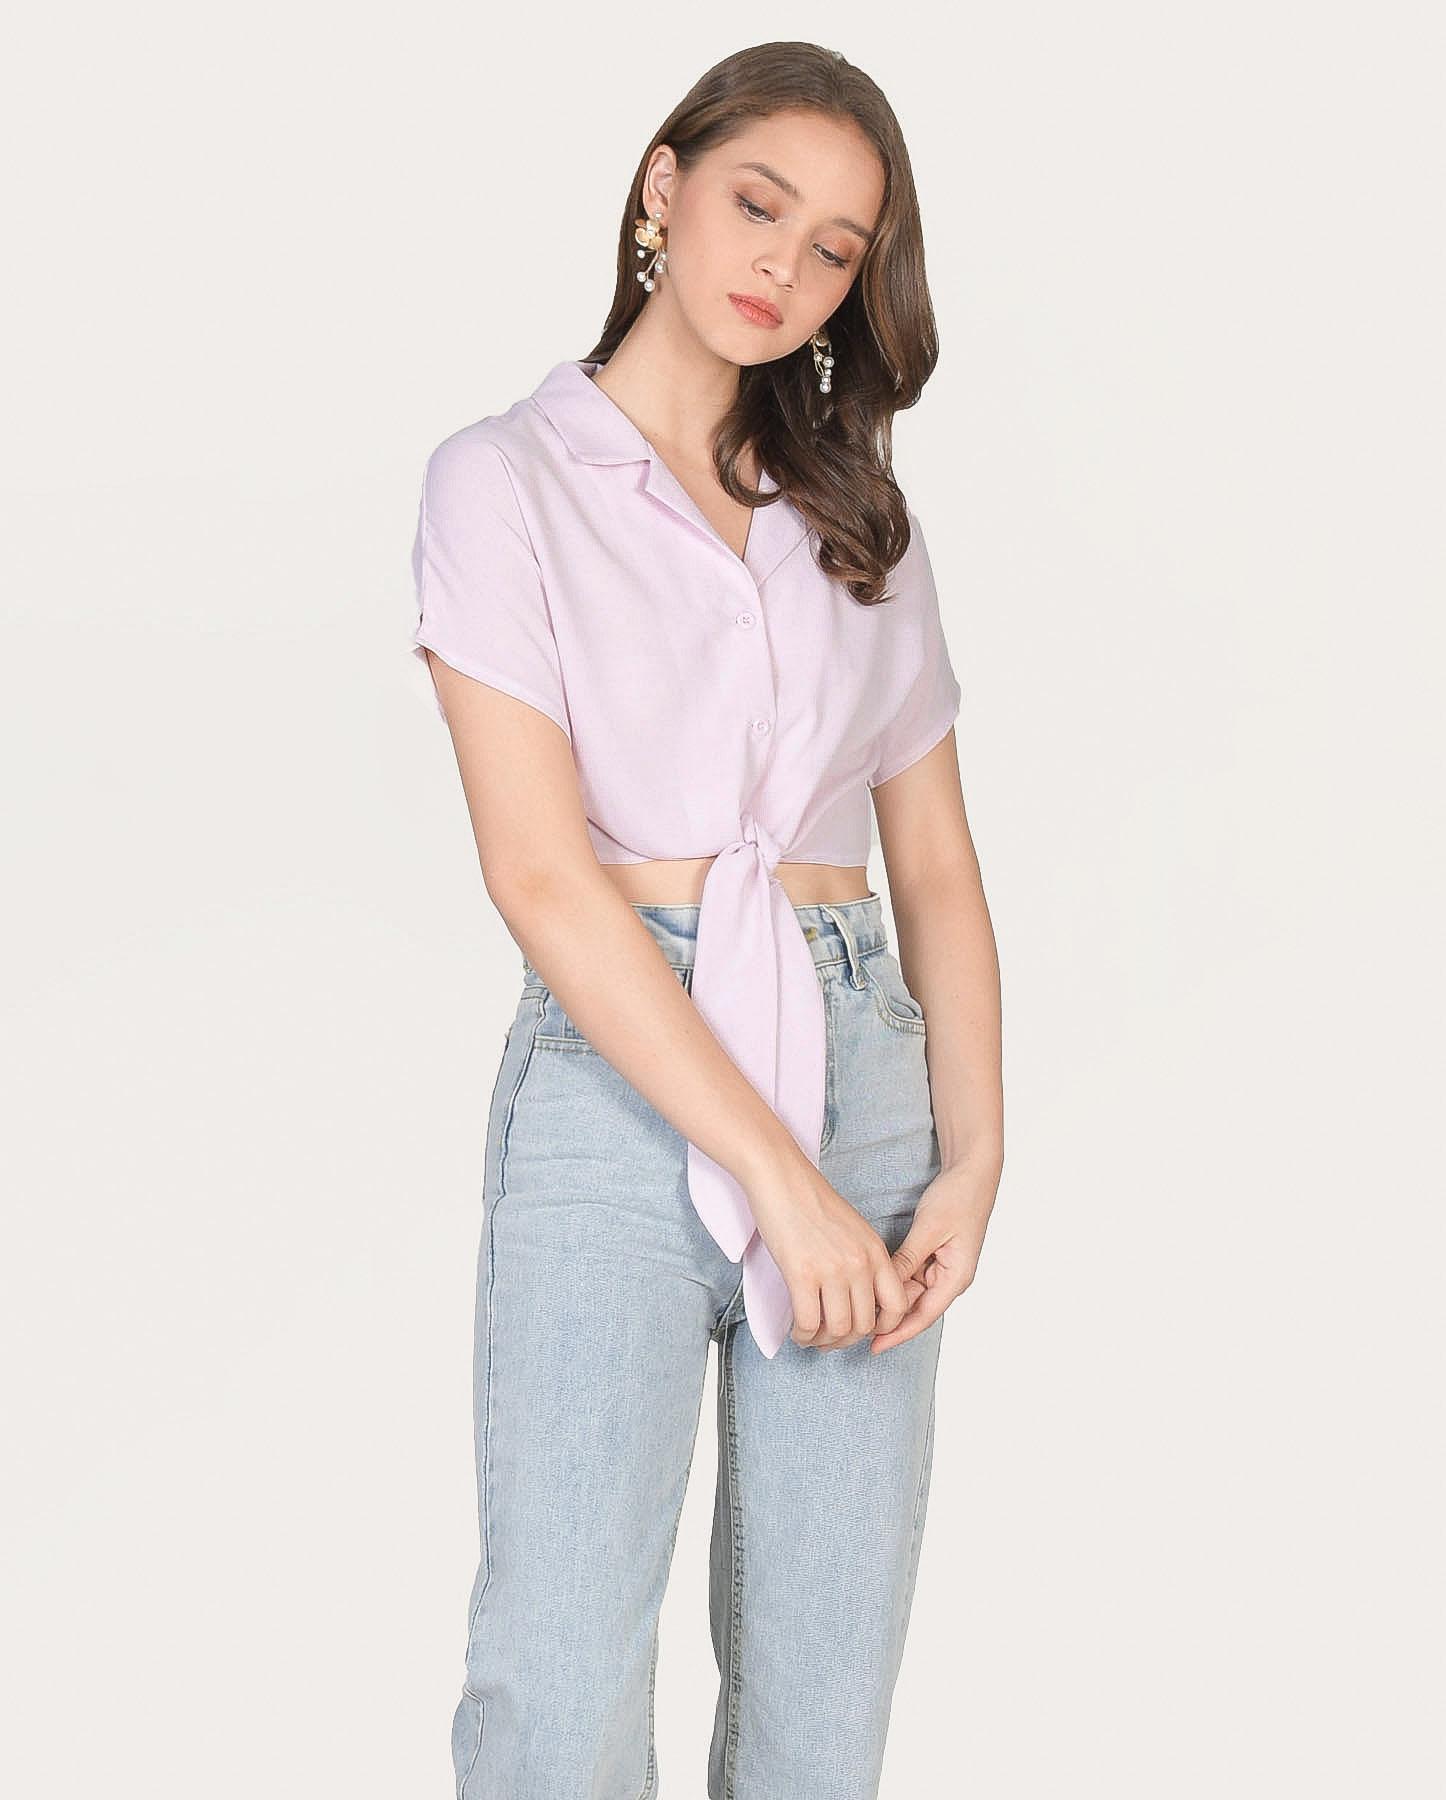 riley-knot-blouse-pale-lilac-1